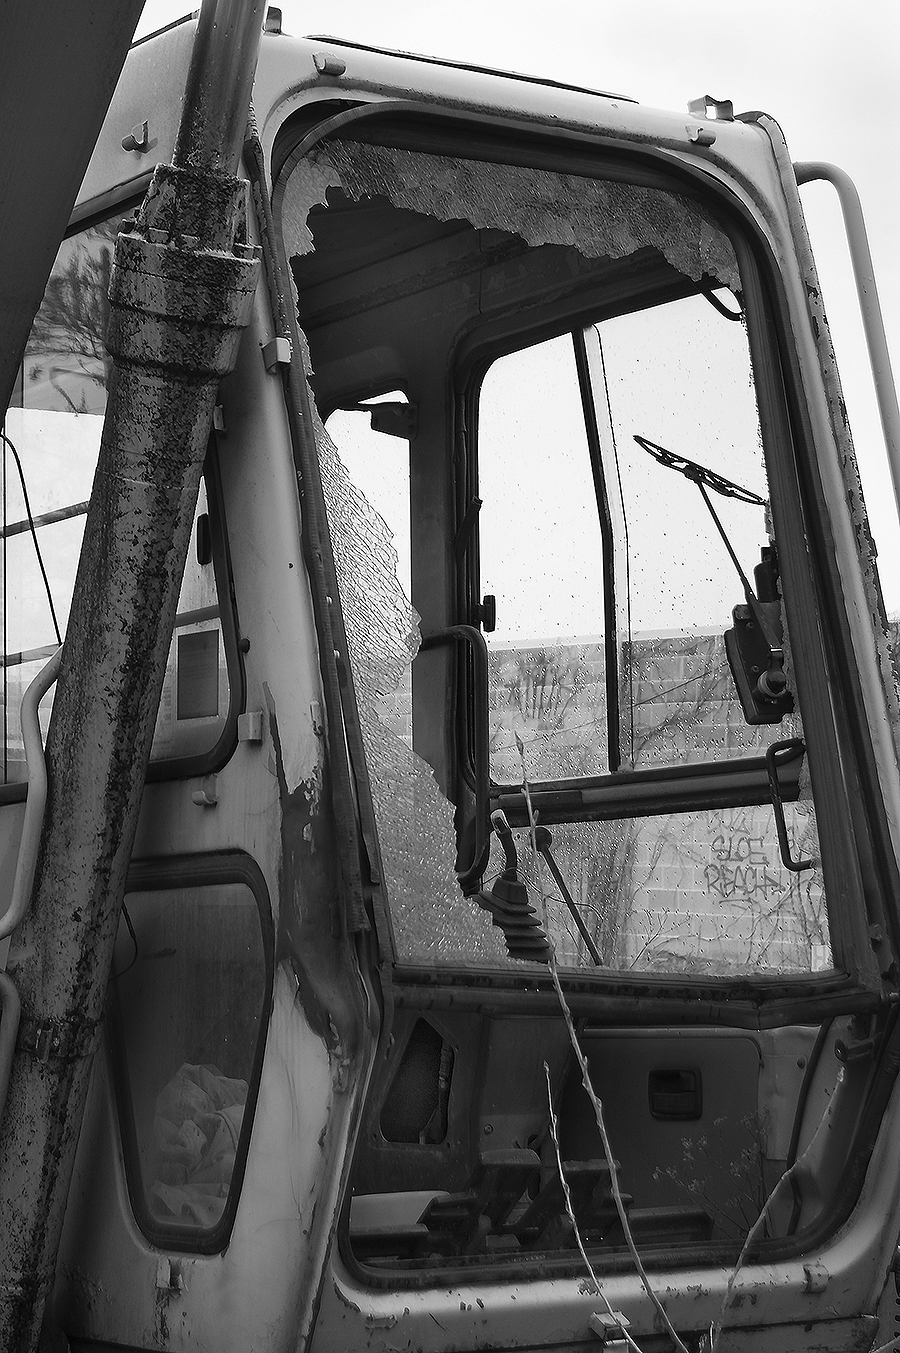 Jasmin_Smoots_Photography_2016_Junk_Yard_Excavator_ruined